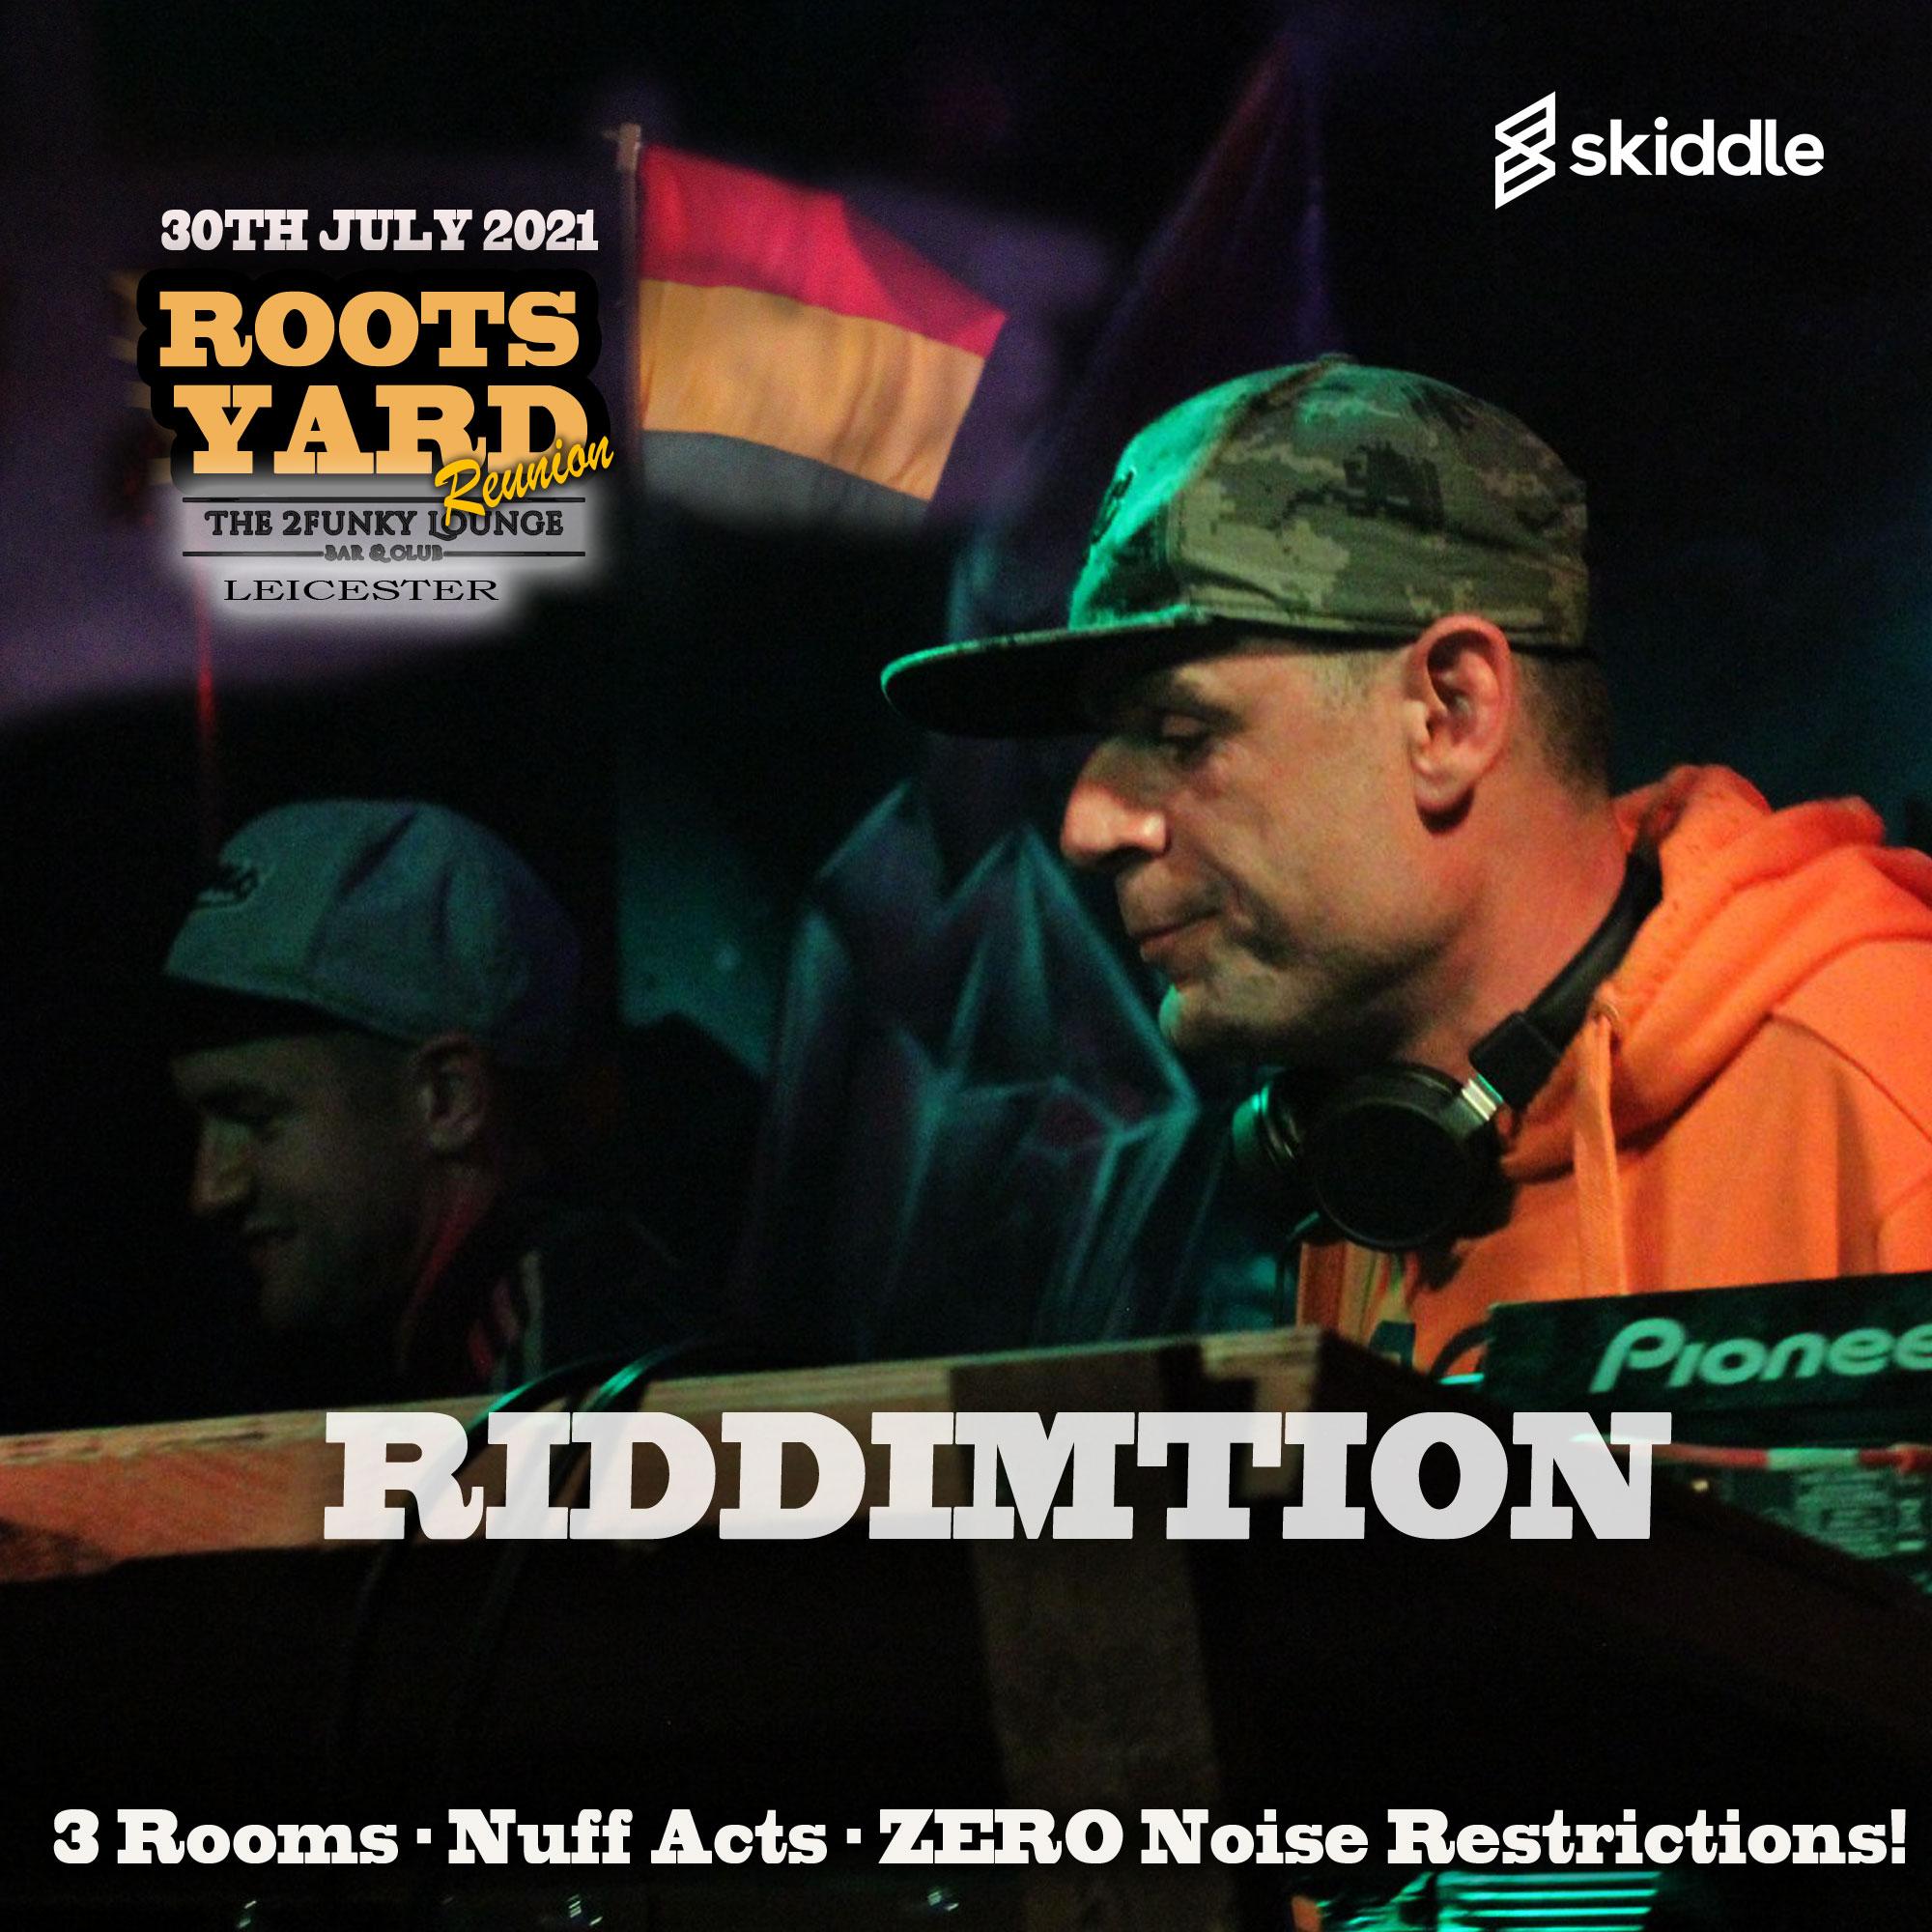 riddimtion---roots-yard-reunion-insta-post